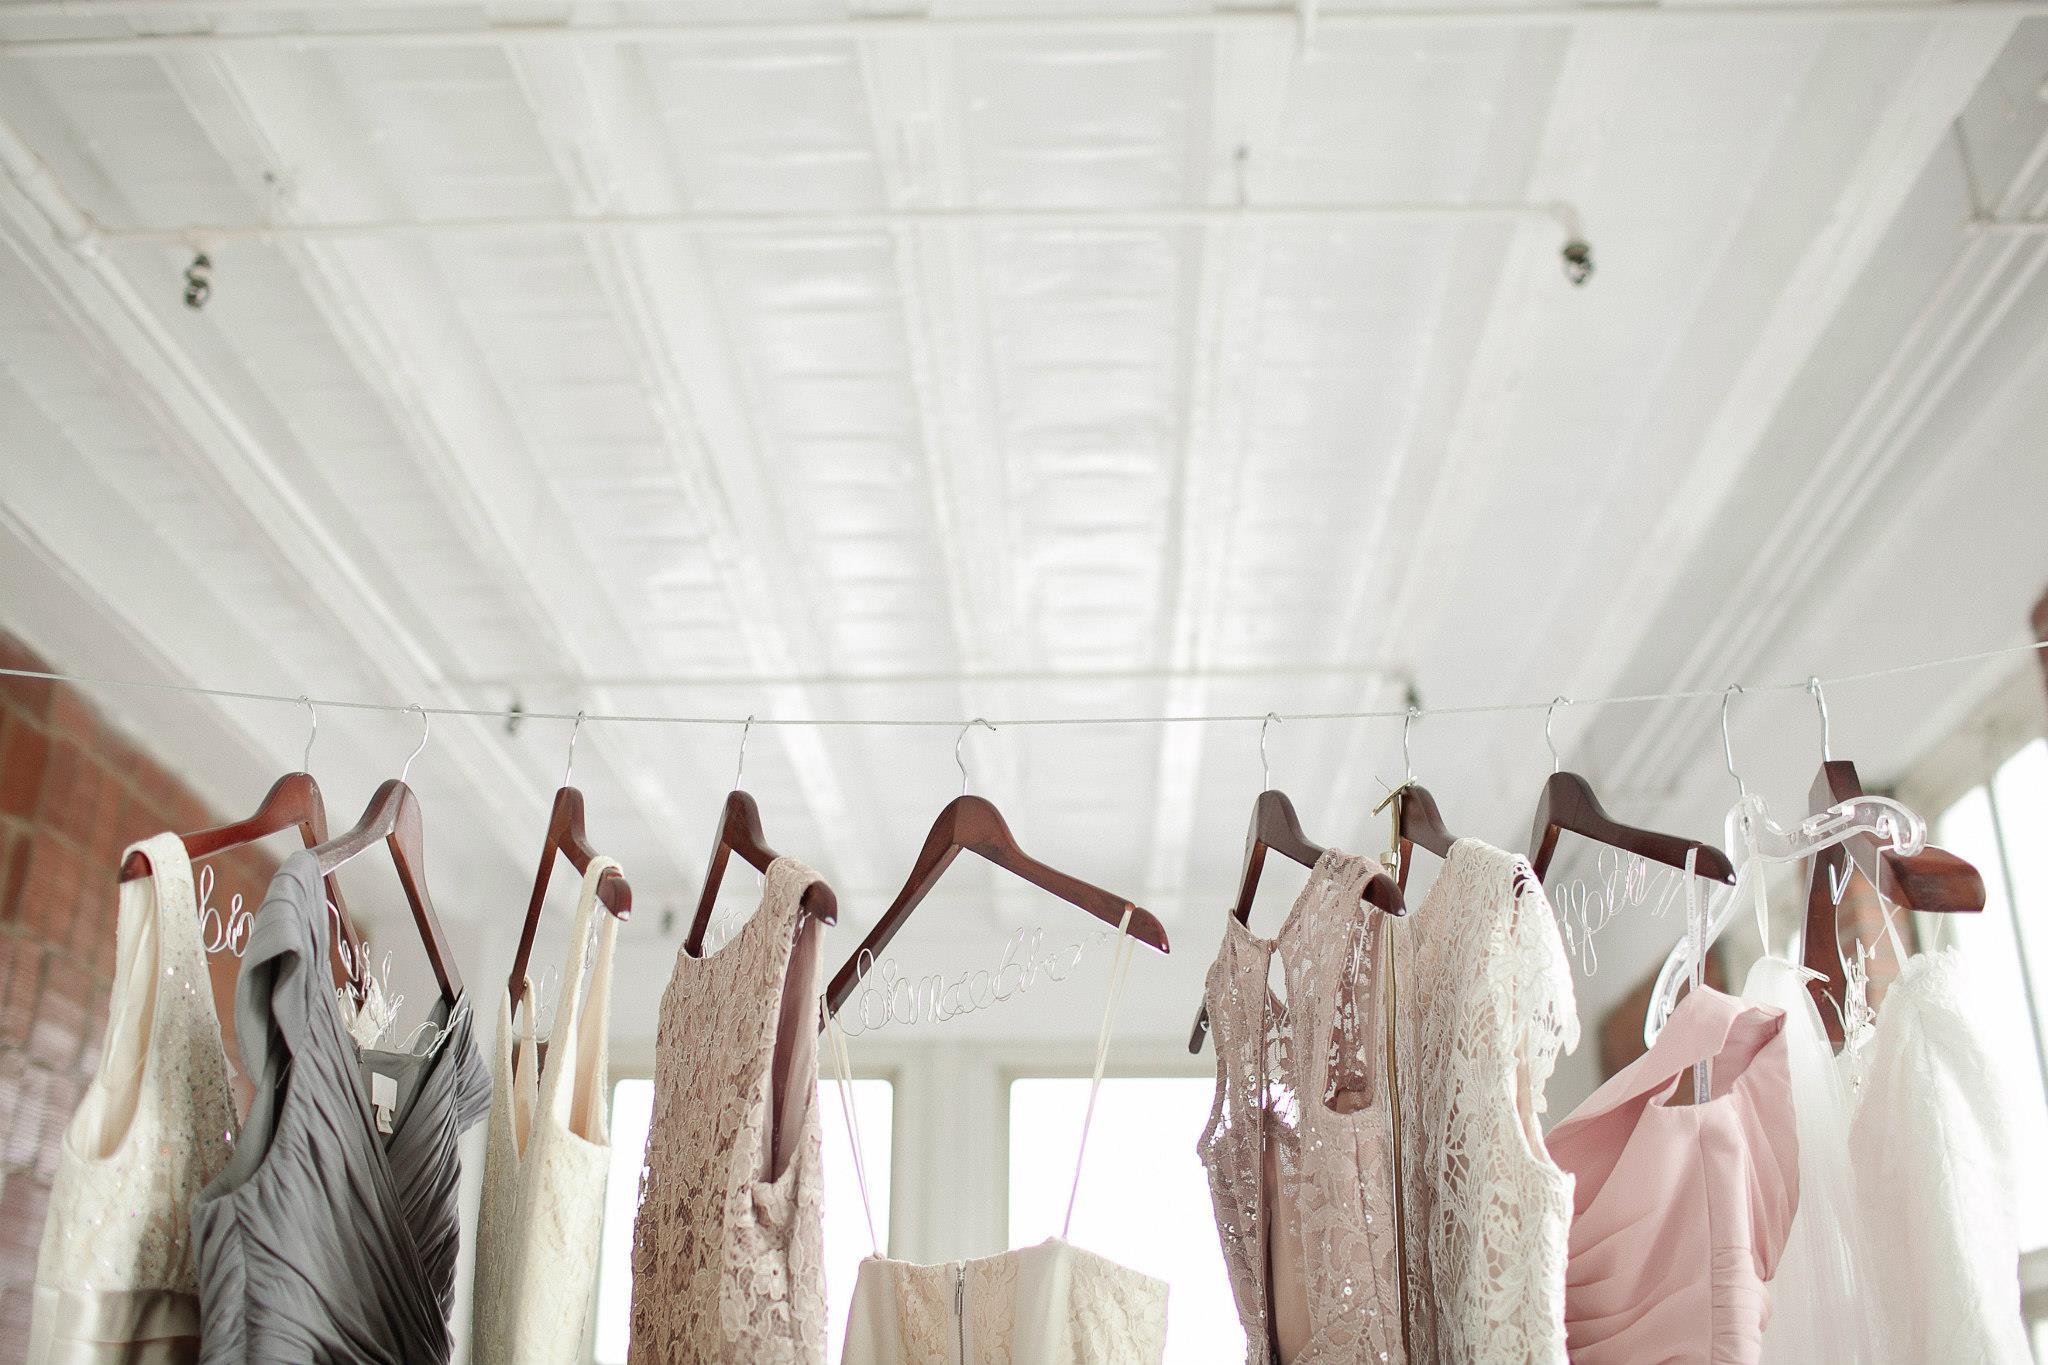 dresses2.jpg